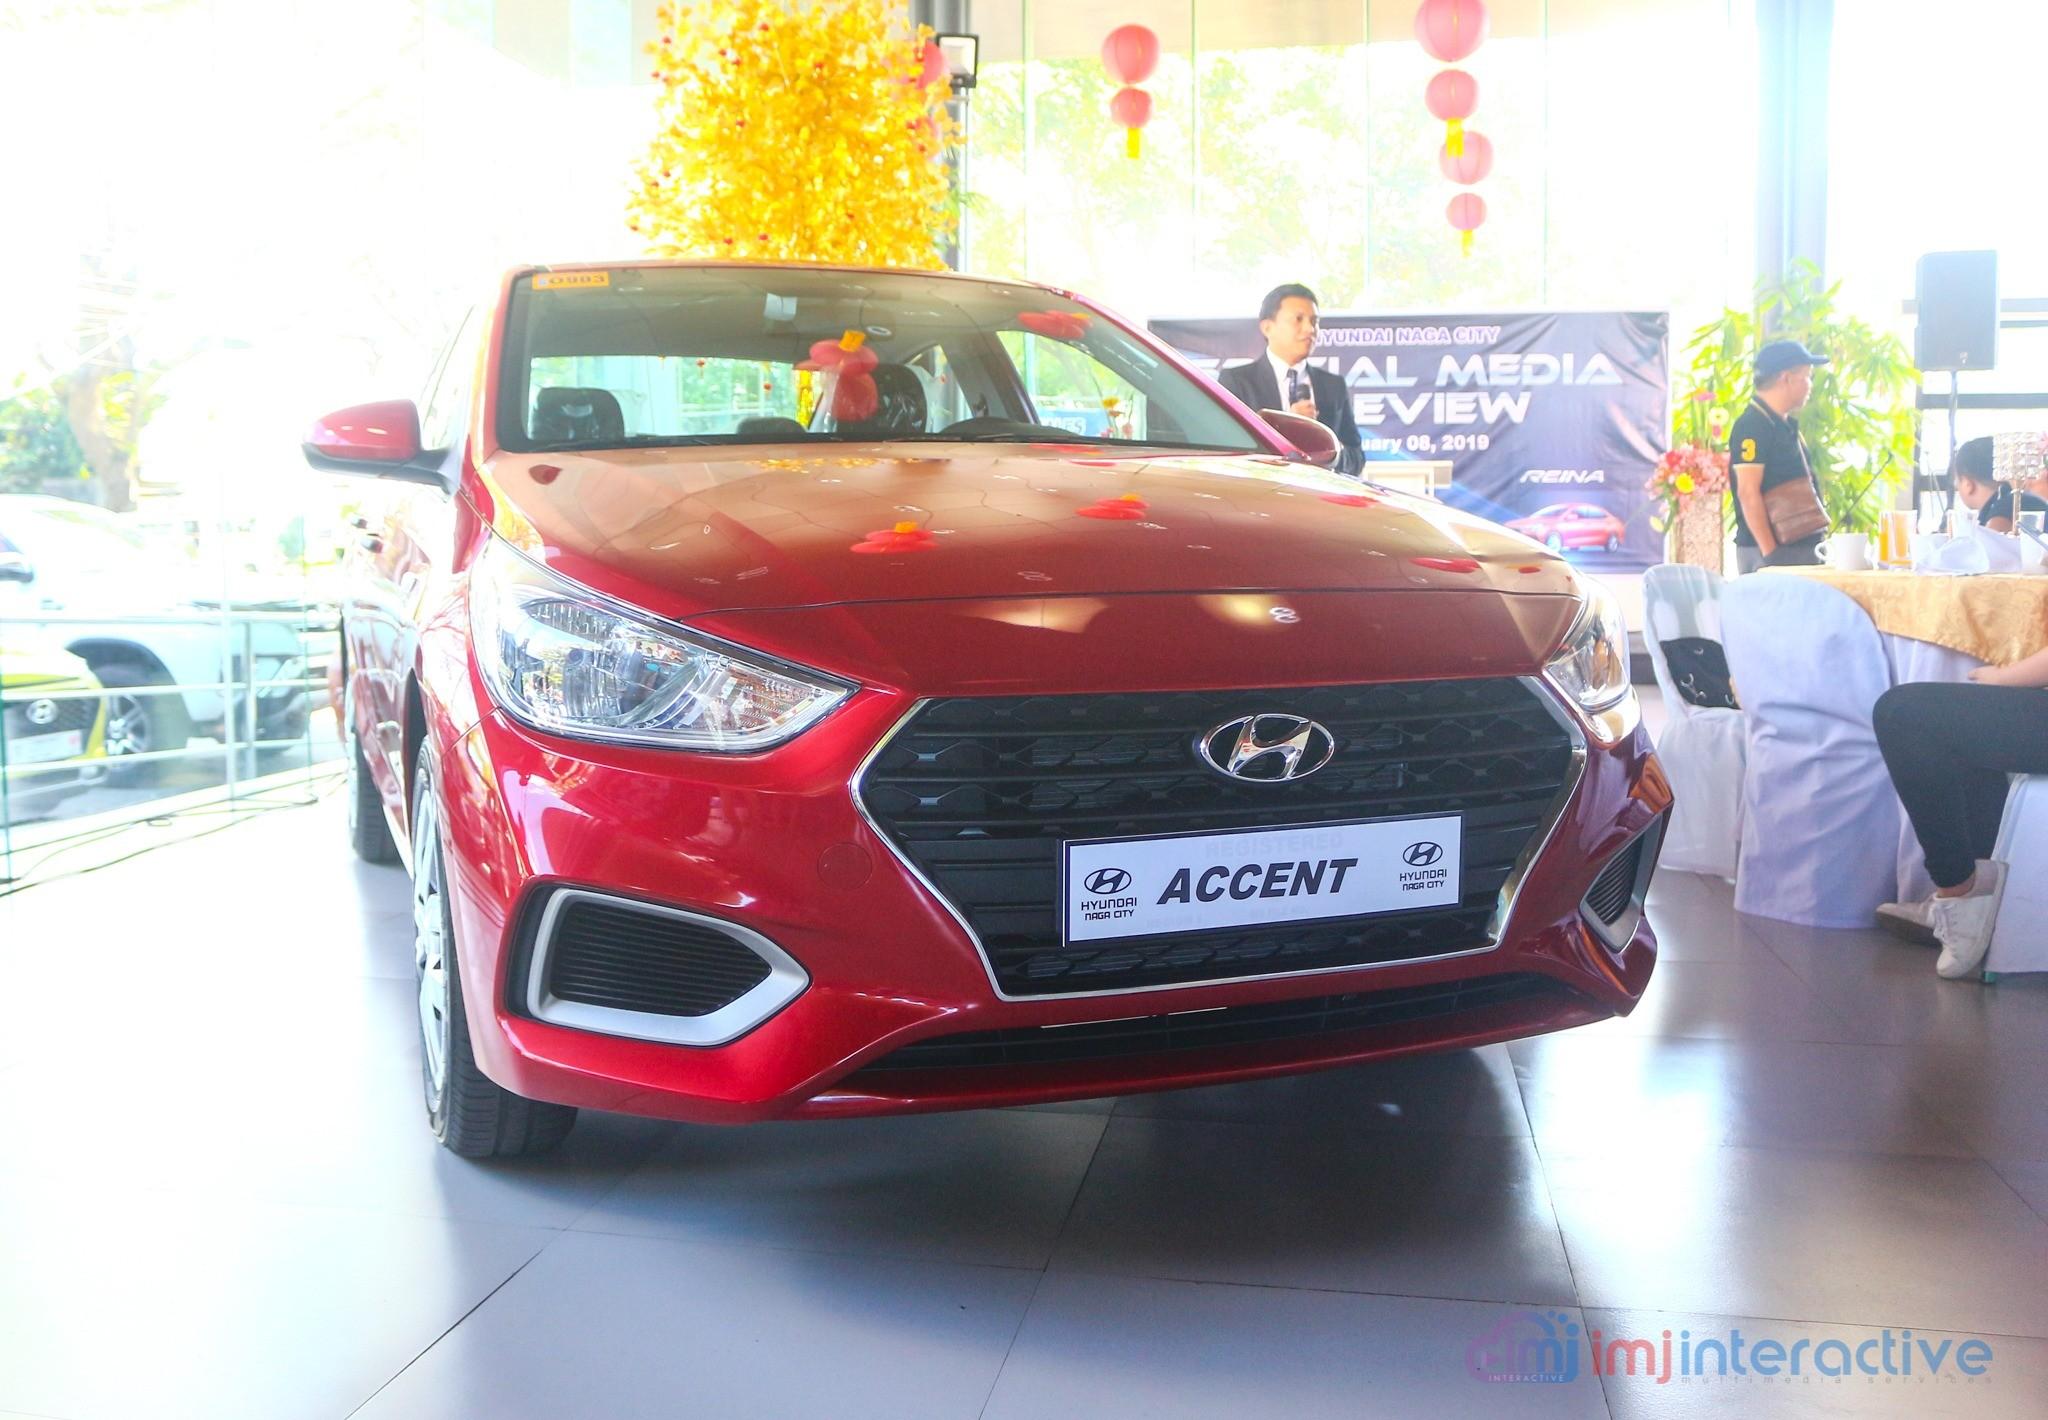 Hyundai Naga launches hybrid Ioniq, all-new Accent and Reina